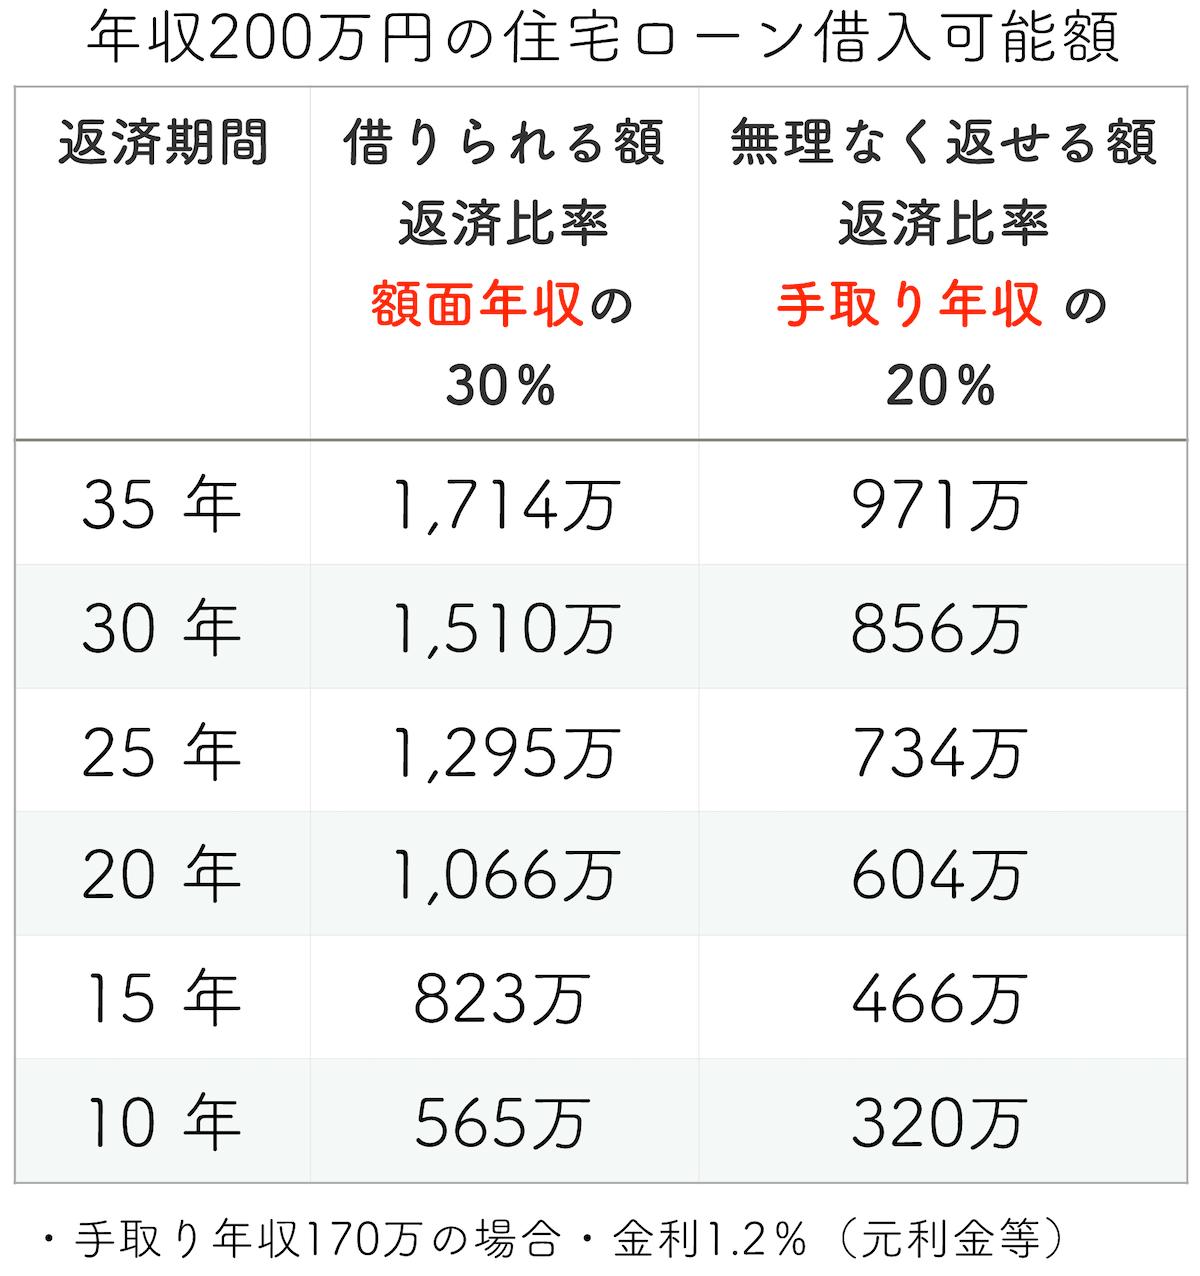 年収200万円の住宅ローン借入可能額